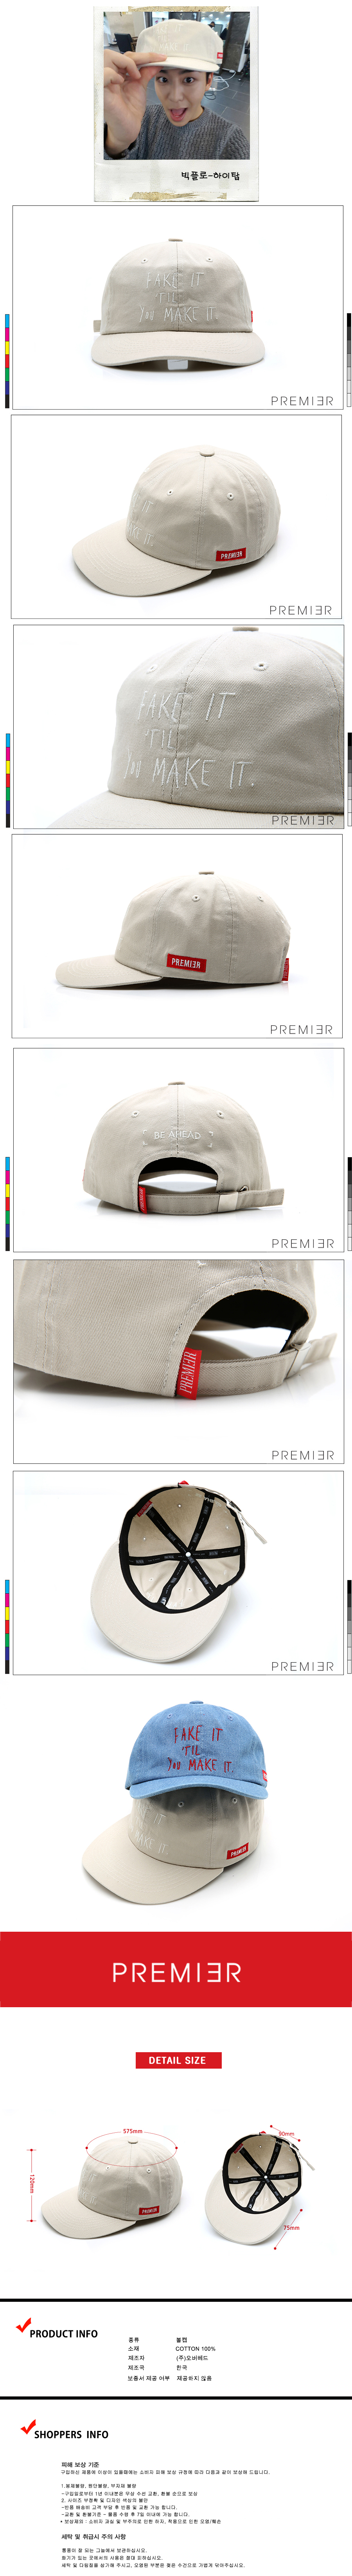 [ PREMIER ] [Premier] Washing Ball Cap MAKE IT Beige (P760)